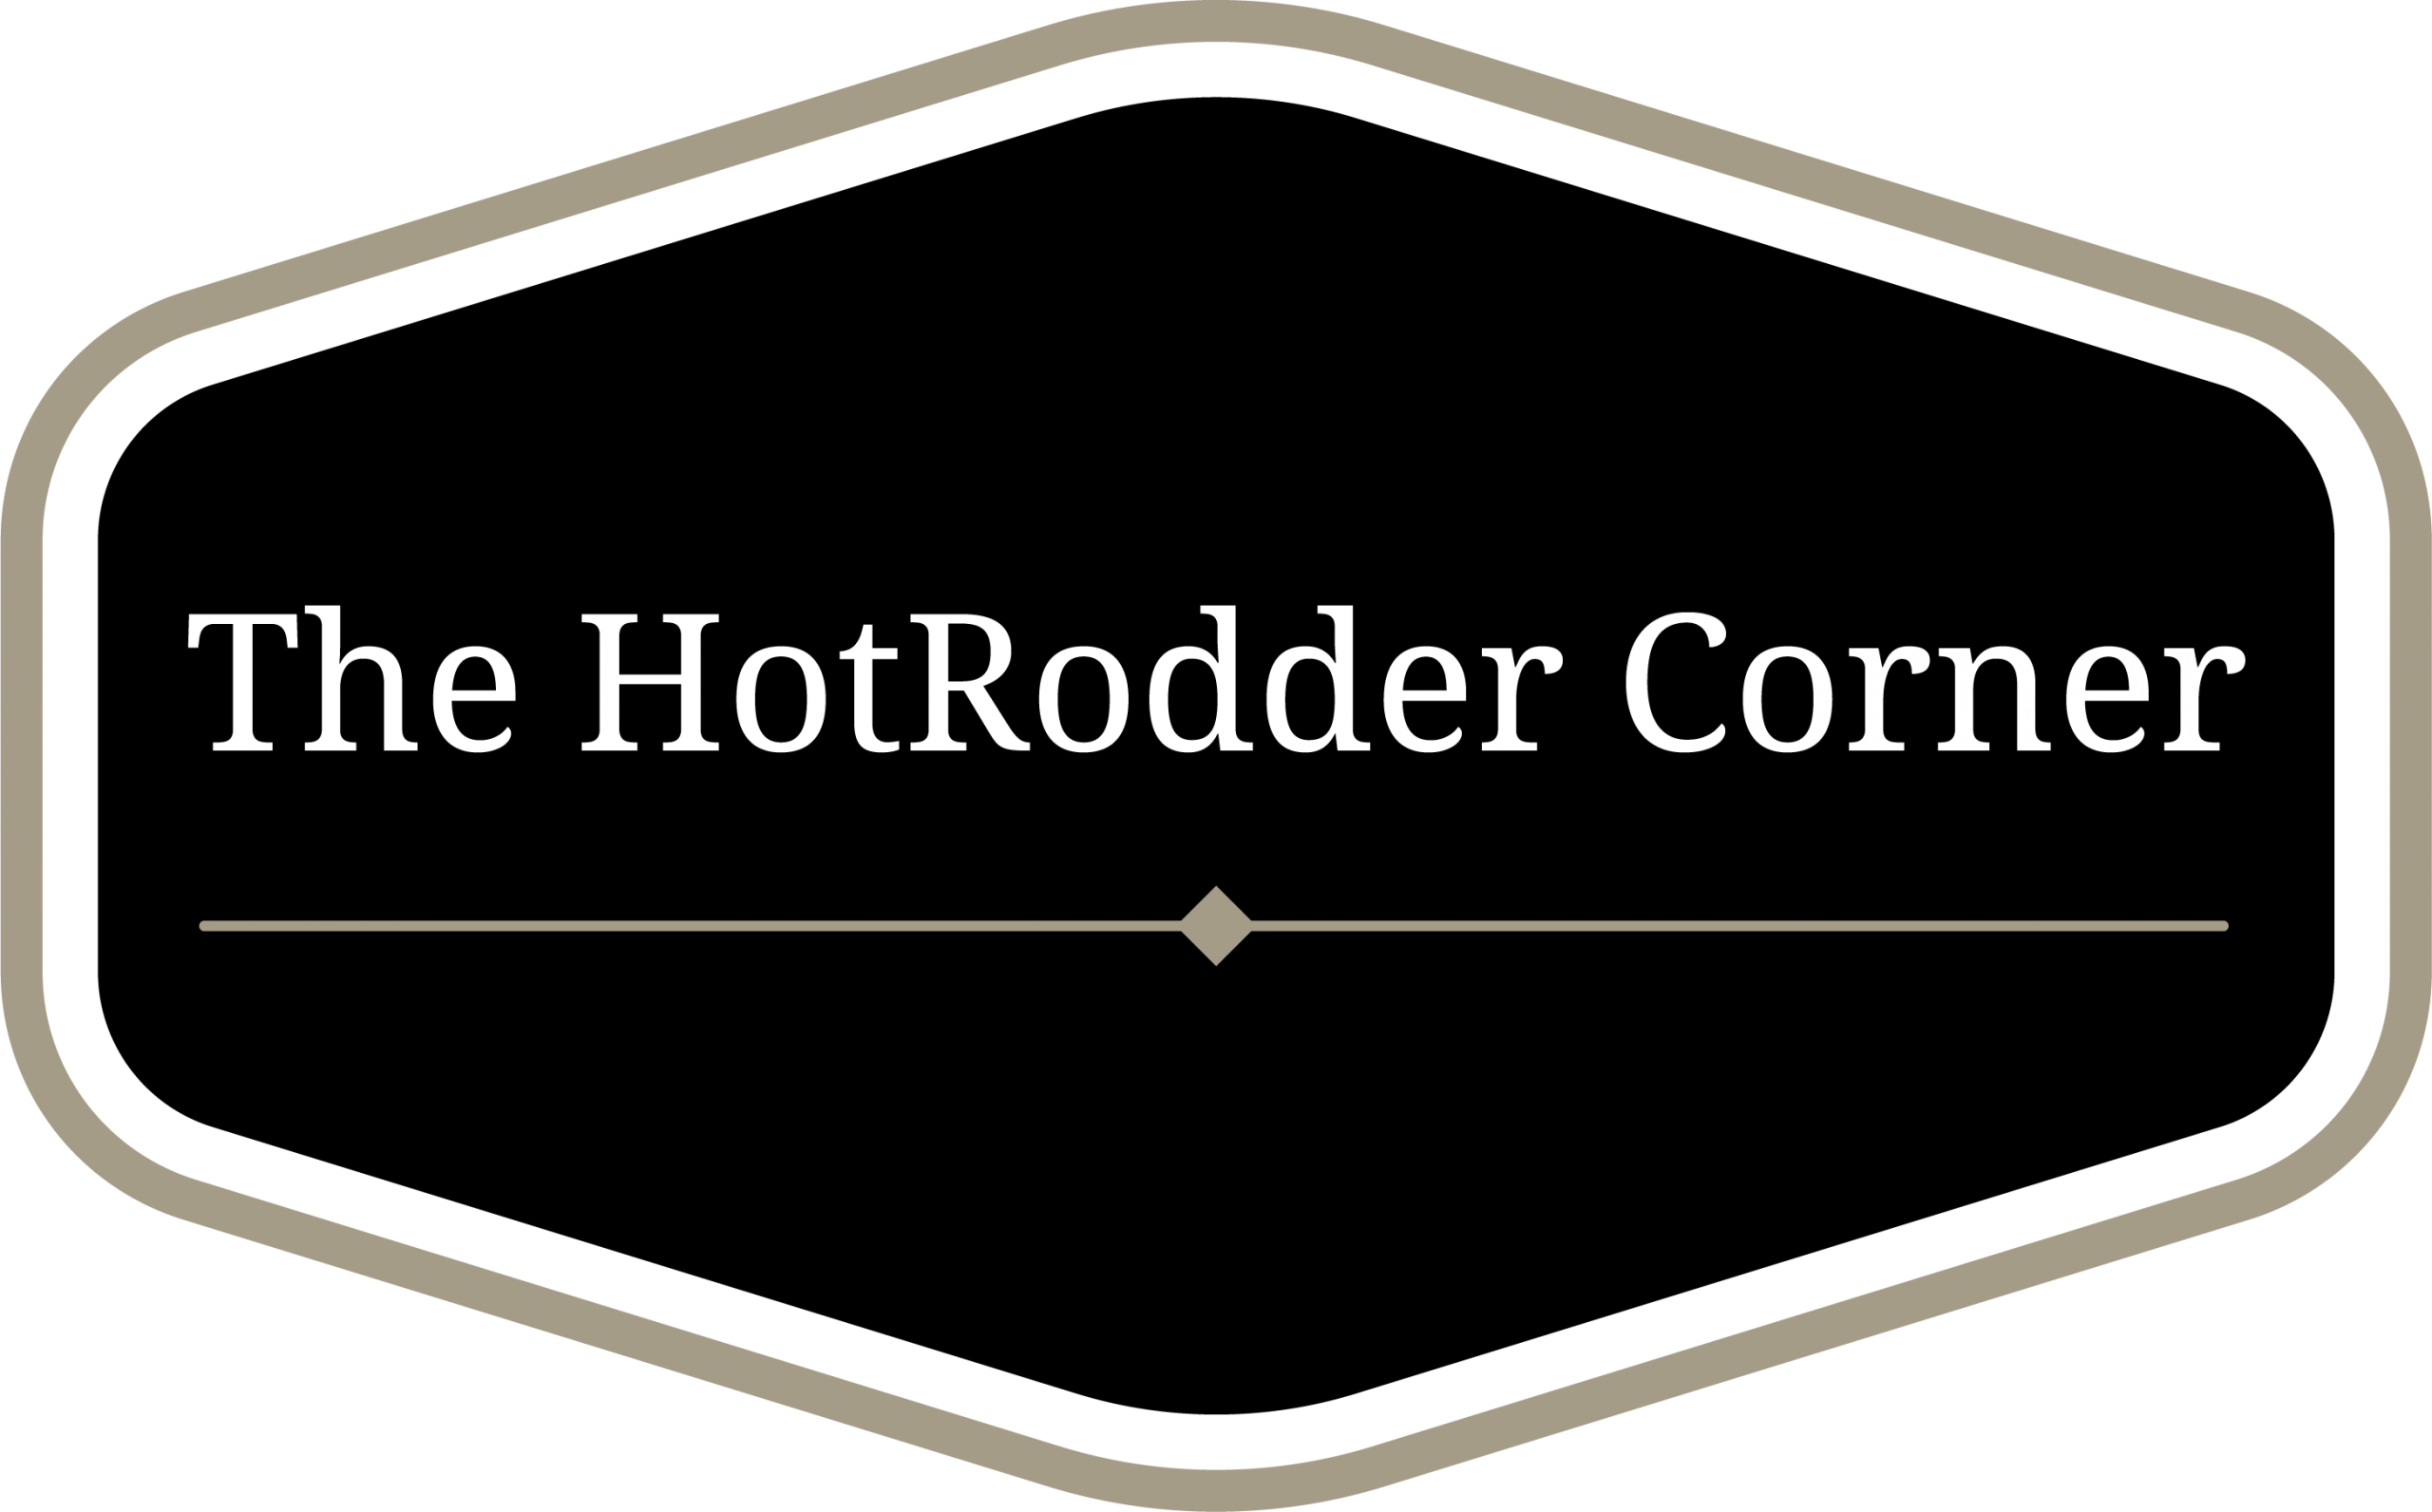 TheHotrodderCorner